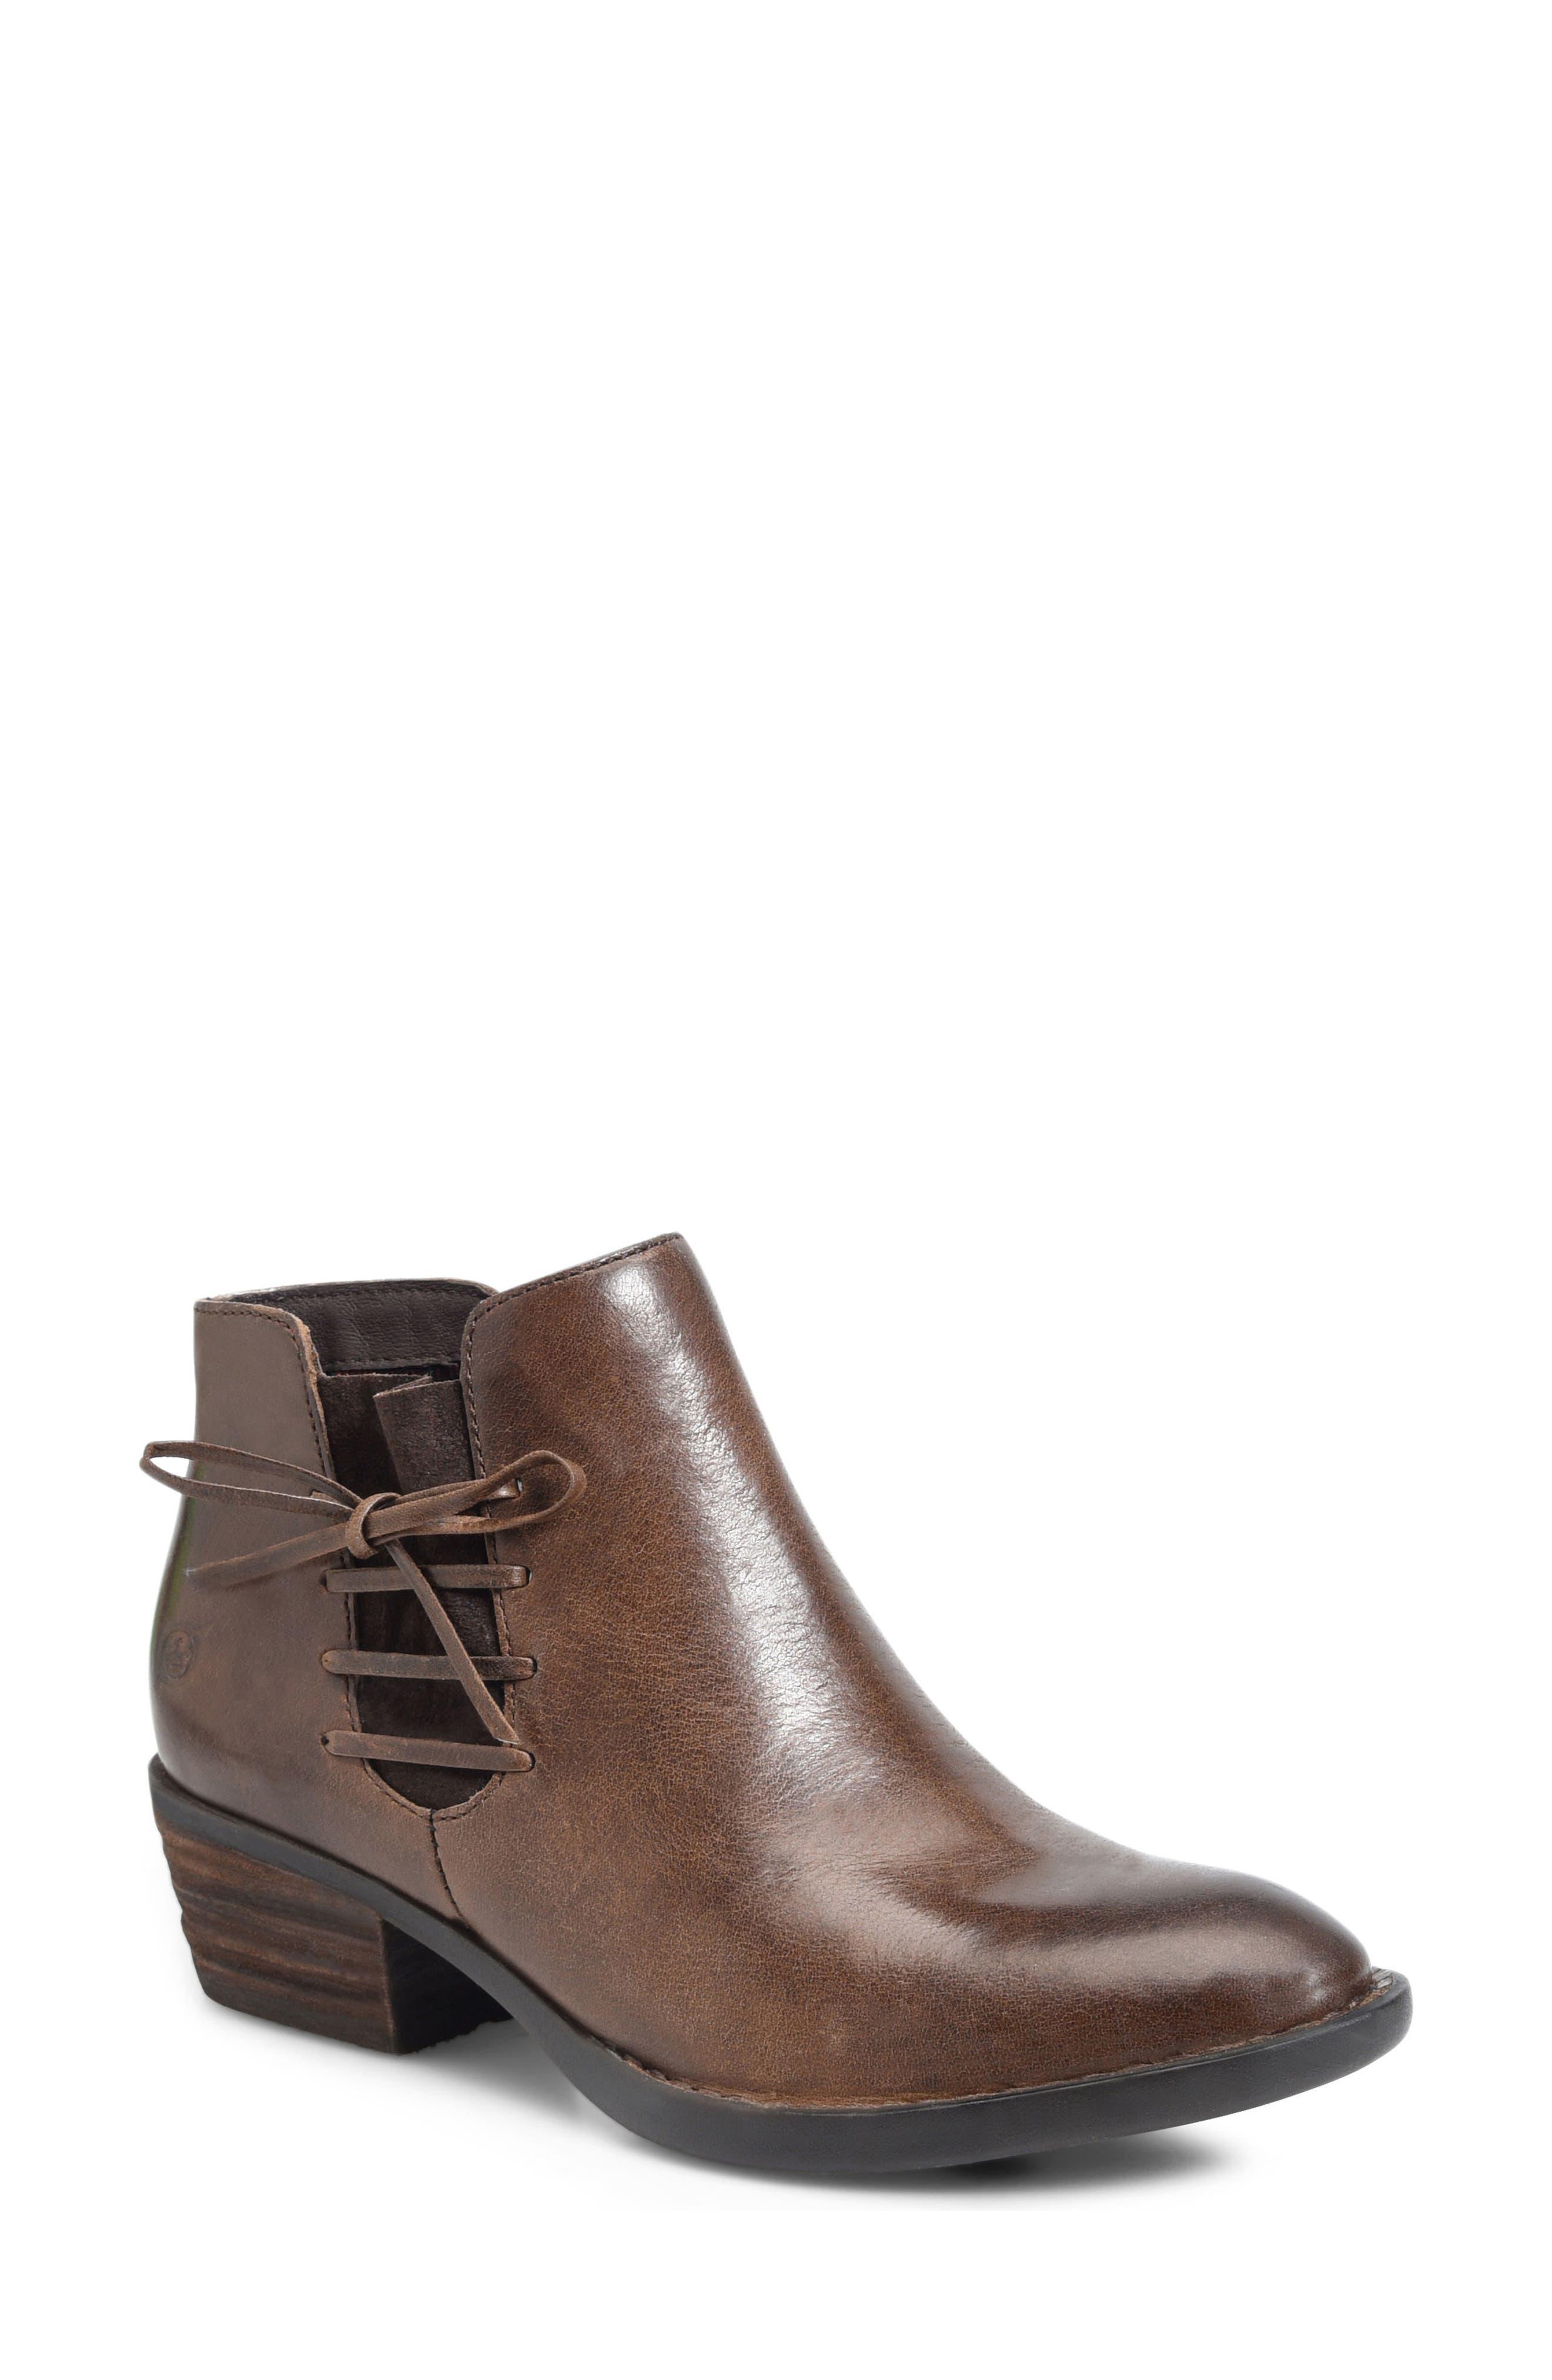 Bowlen Bootie,                             Main thumbnail 1, color,                             Brown Leather